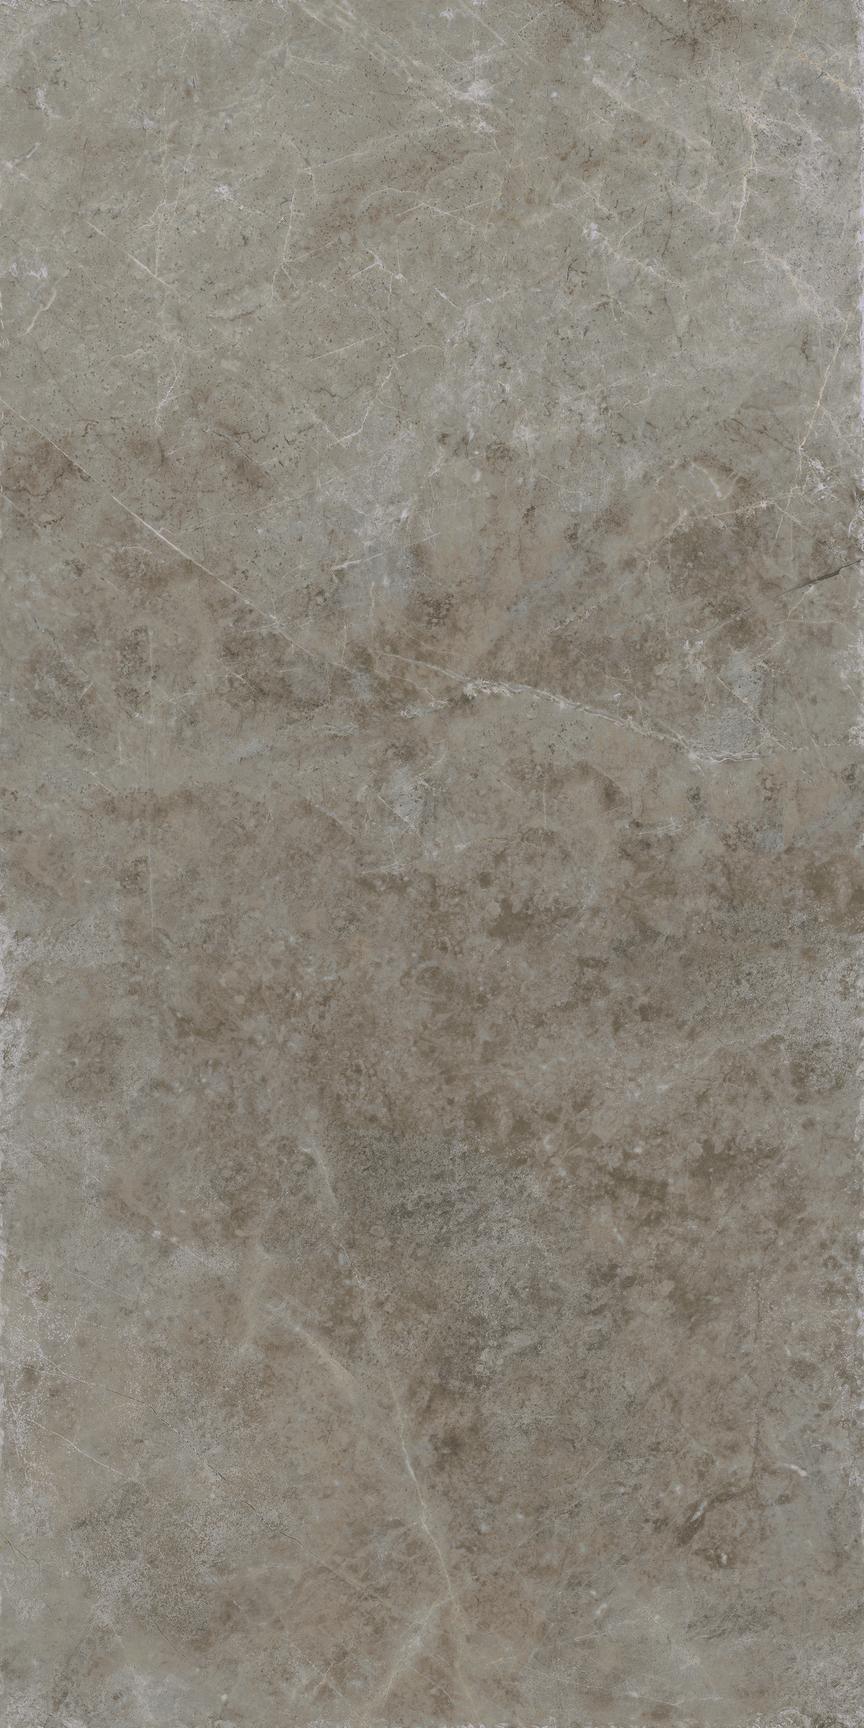 Chateau Floor/Wall Tile 24x48